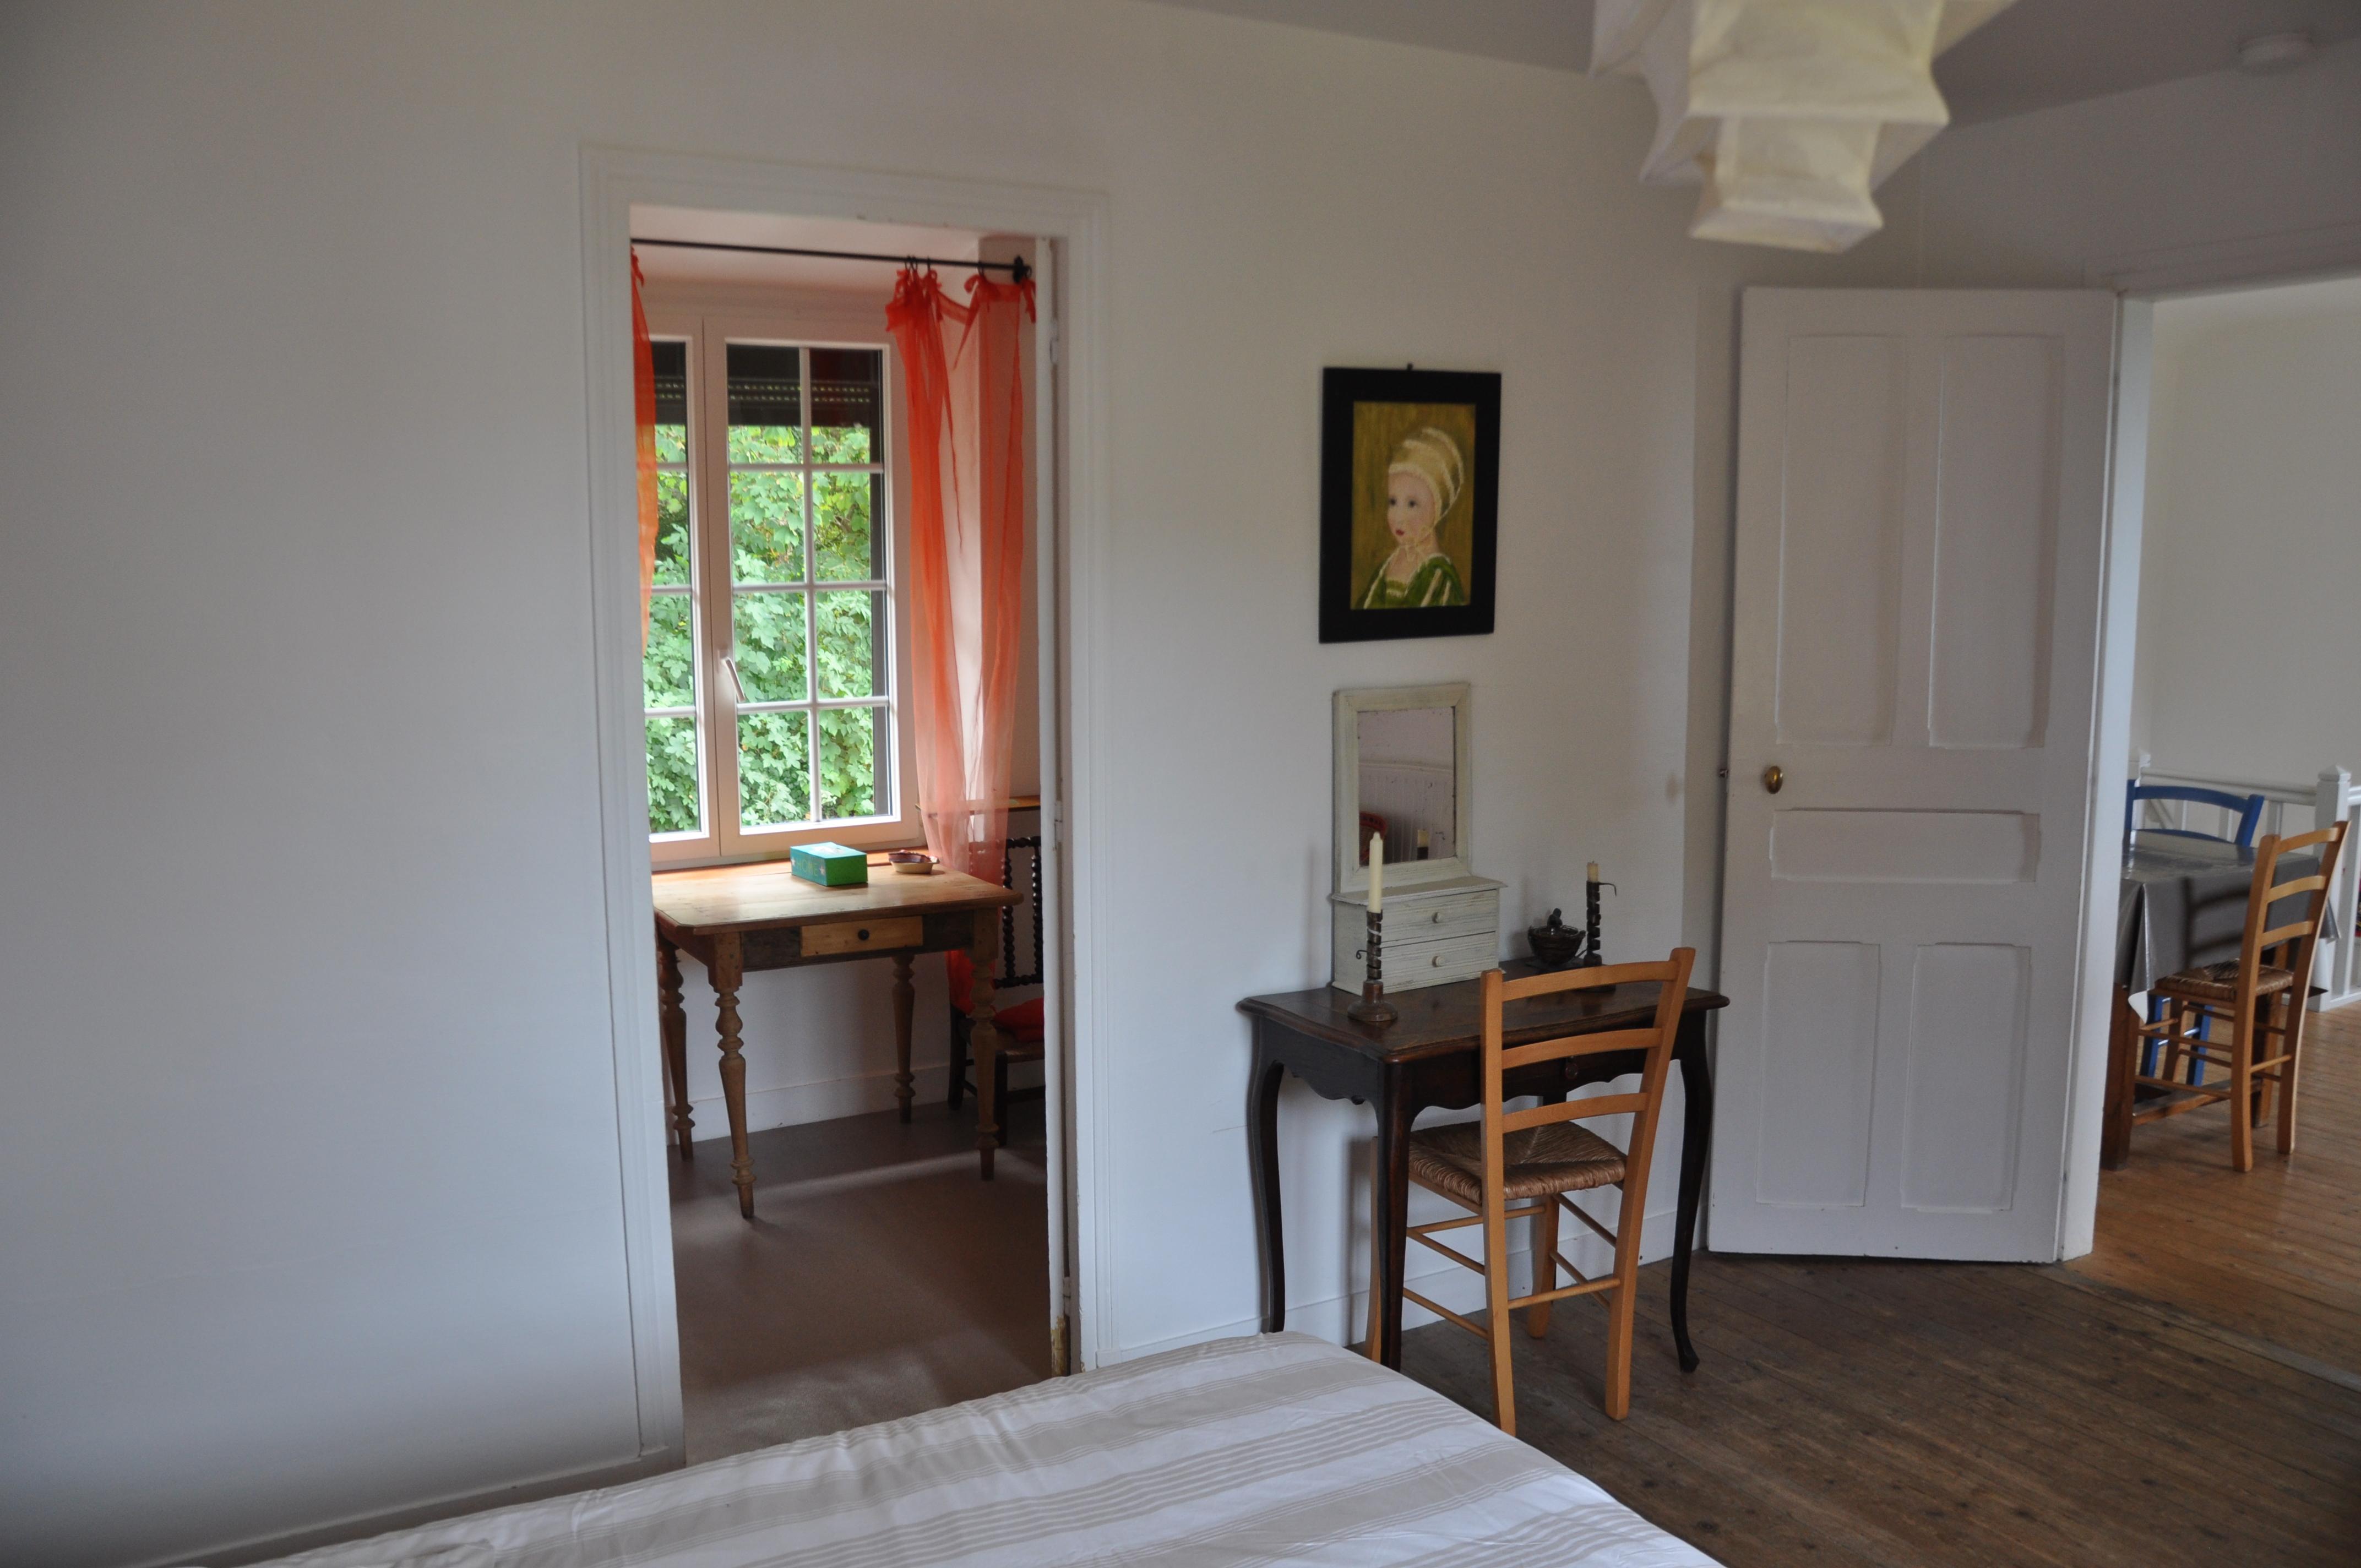 22 maison louer veules les roses bel air. Black Bedroom Furniture Sets. Home Design Ideas